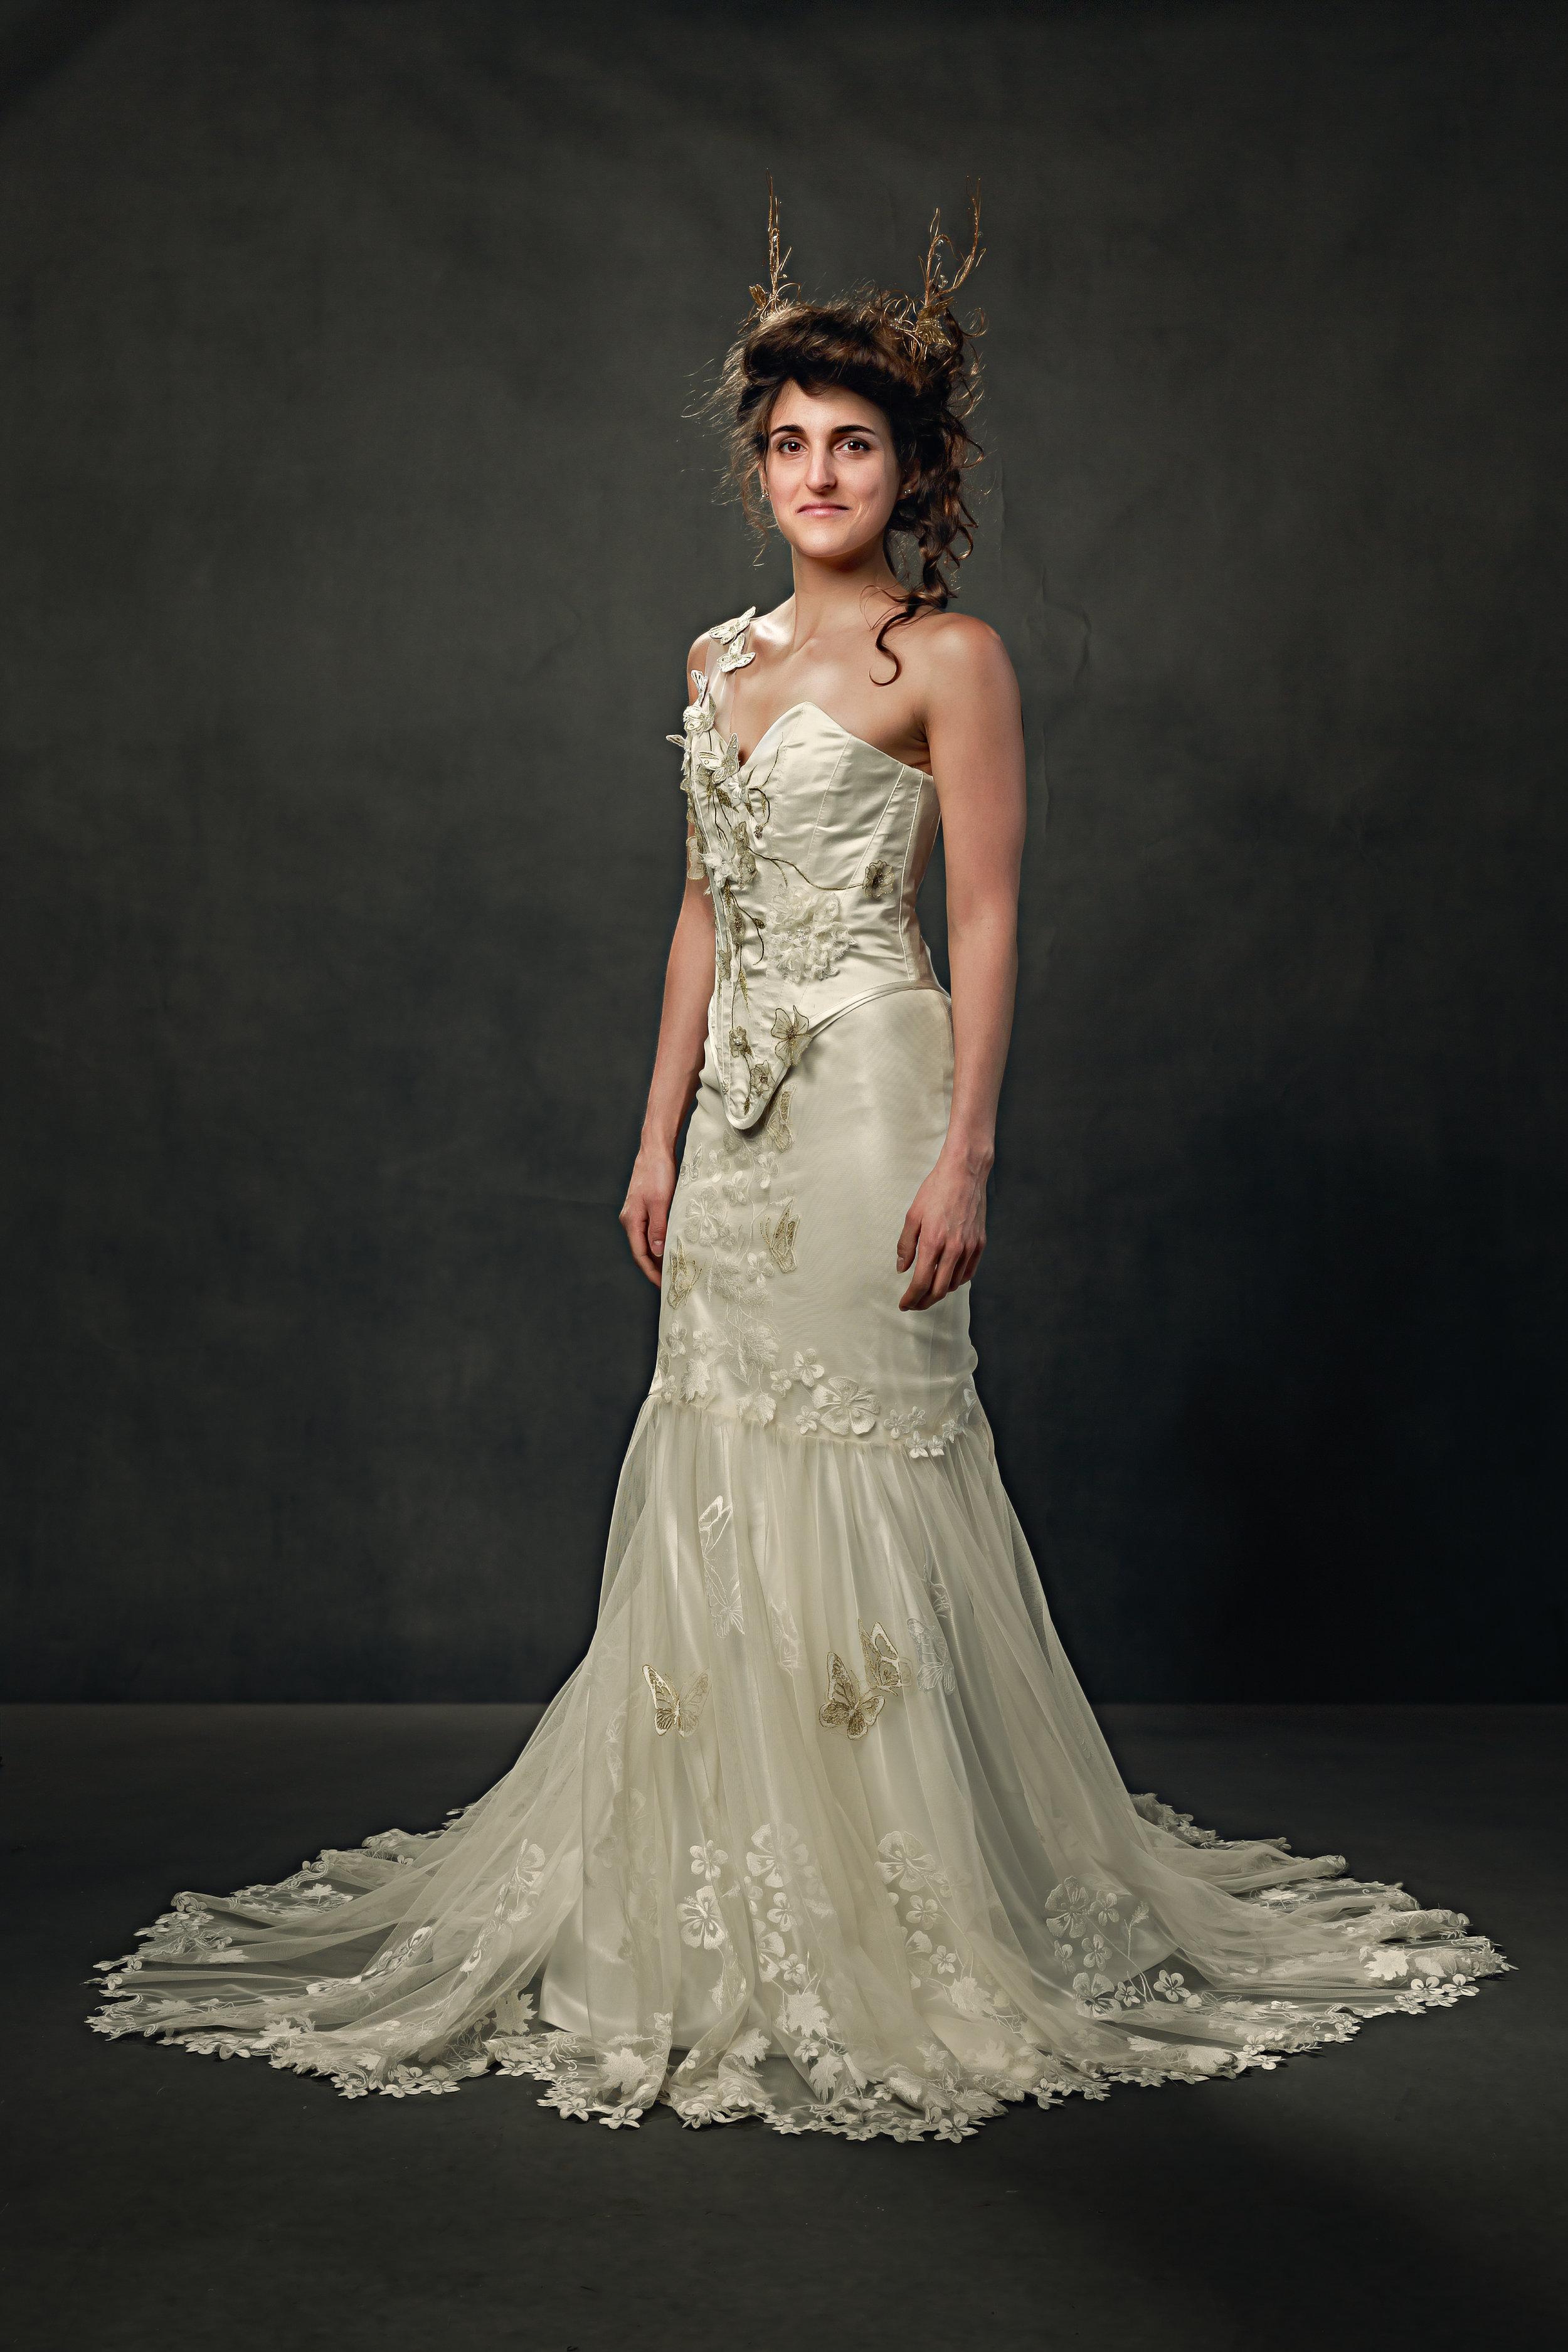 martin dobson wedding dress - 0075 - March 07, 2018 - copyright Foyers Photography-Edit.jpg